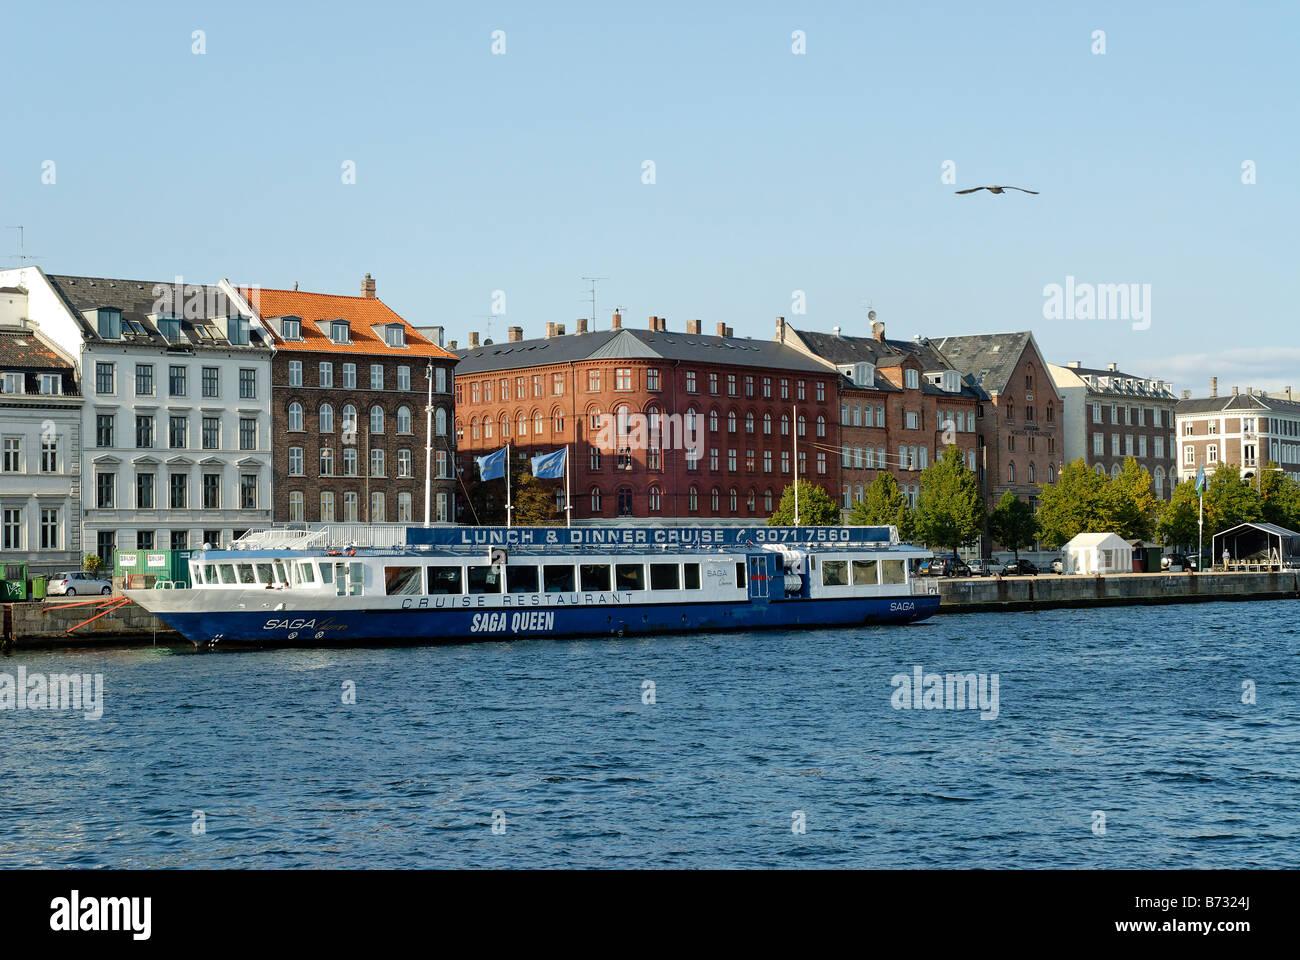 Cruise restaurant at the mooring Copenhagen Denmark - Stock Image